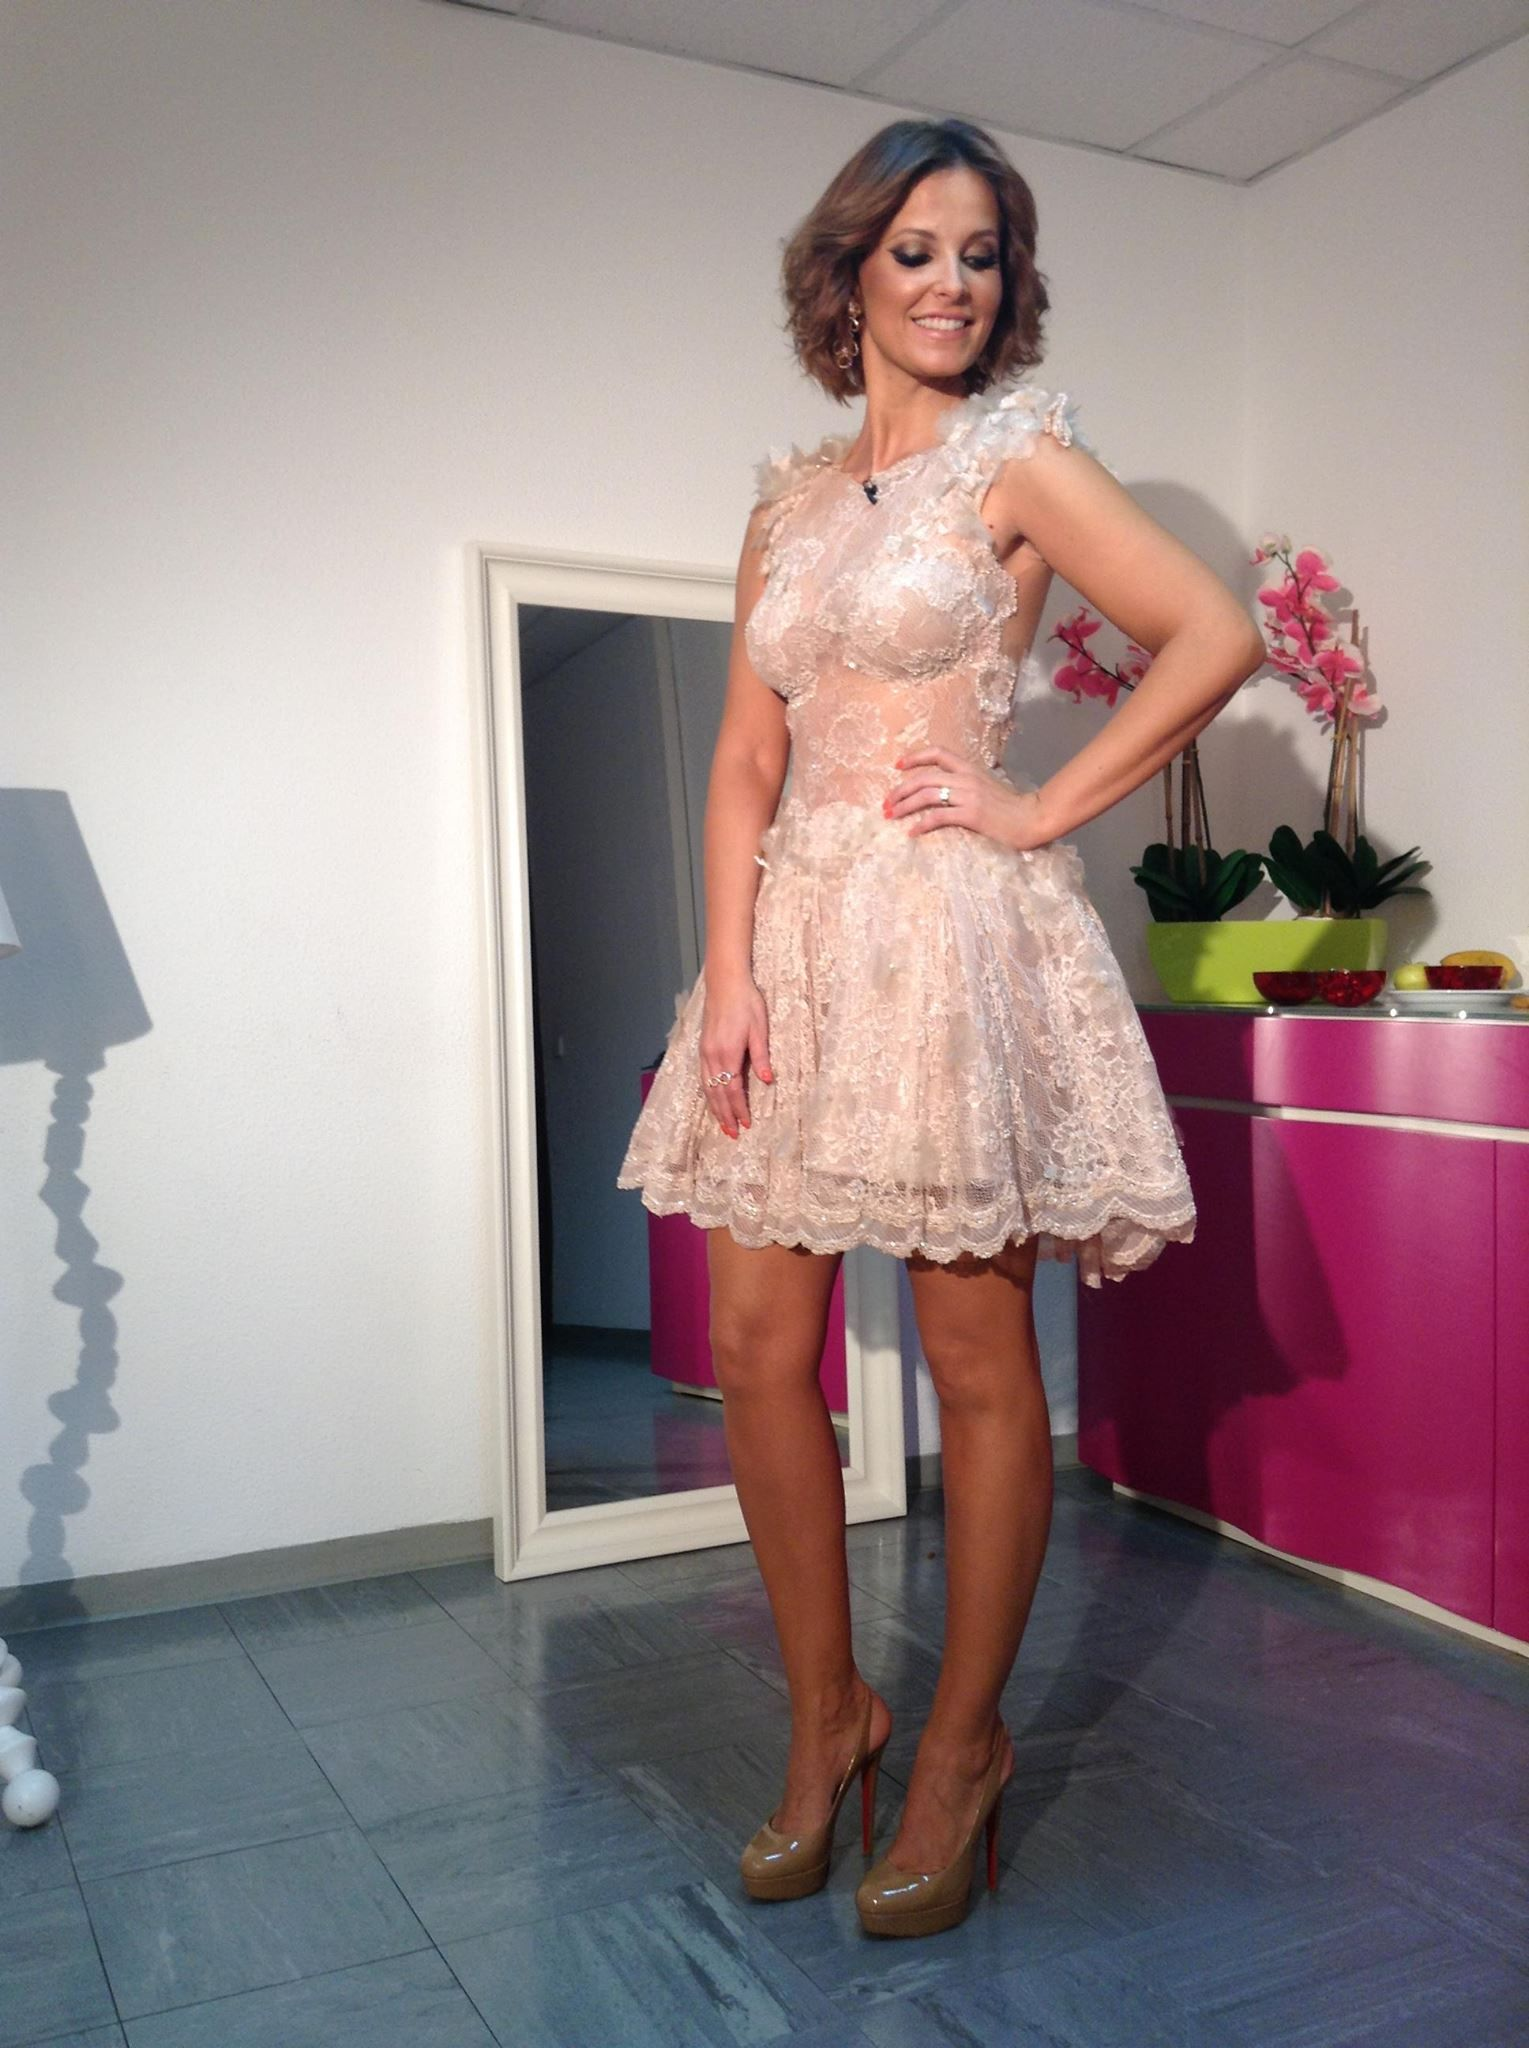 Micaela Oliveira #dress   Micaela Oliveira   Pinterest